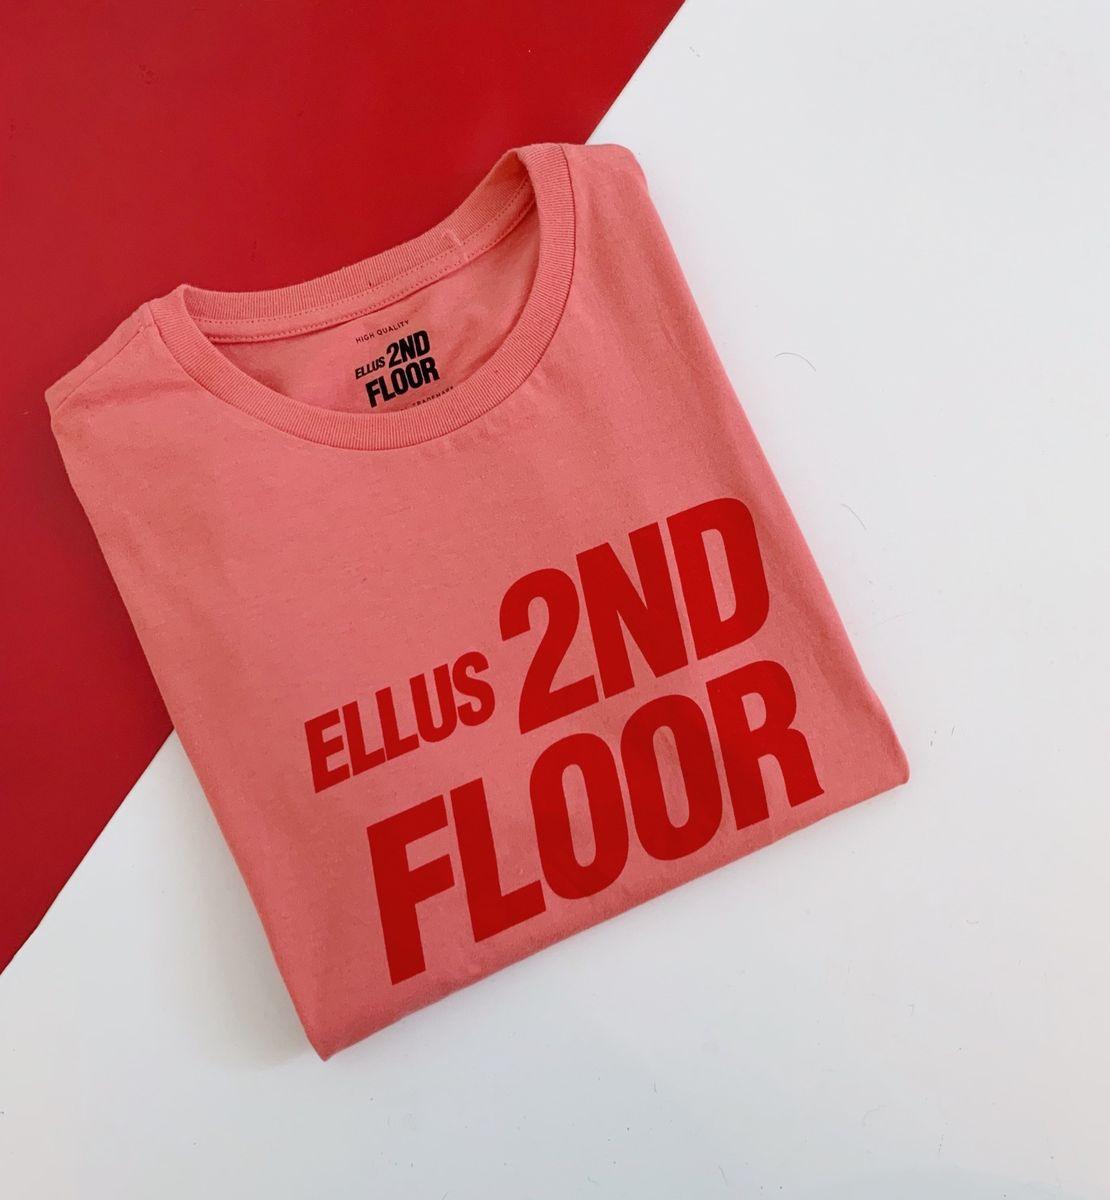 tshirt ellus 2nd floor - blusas ellus